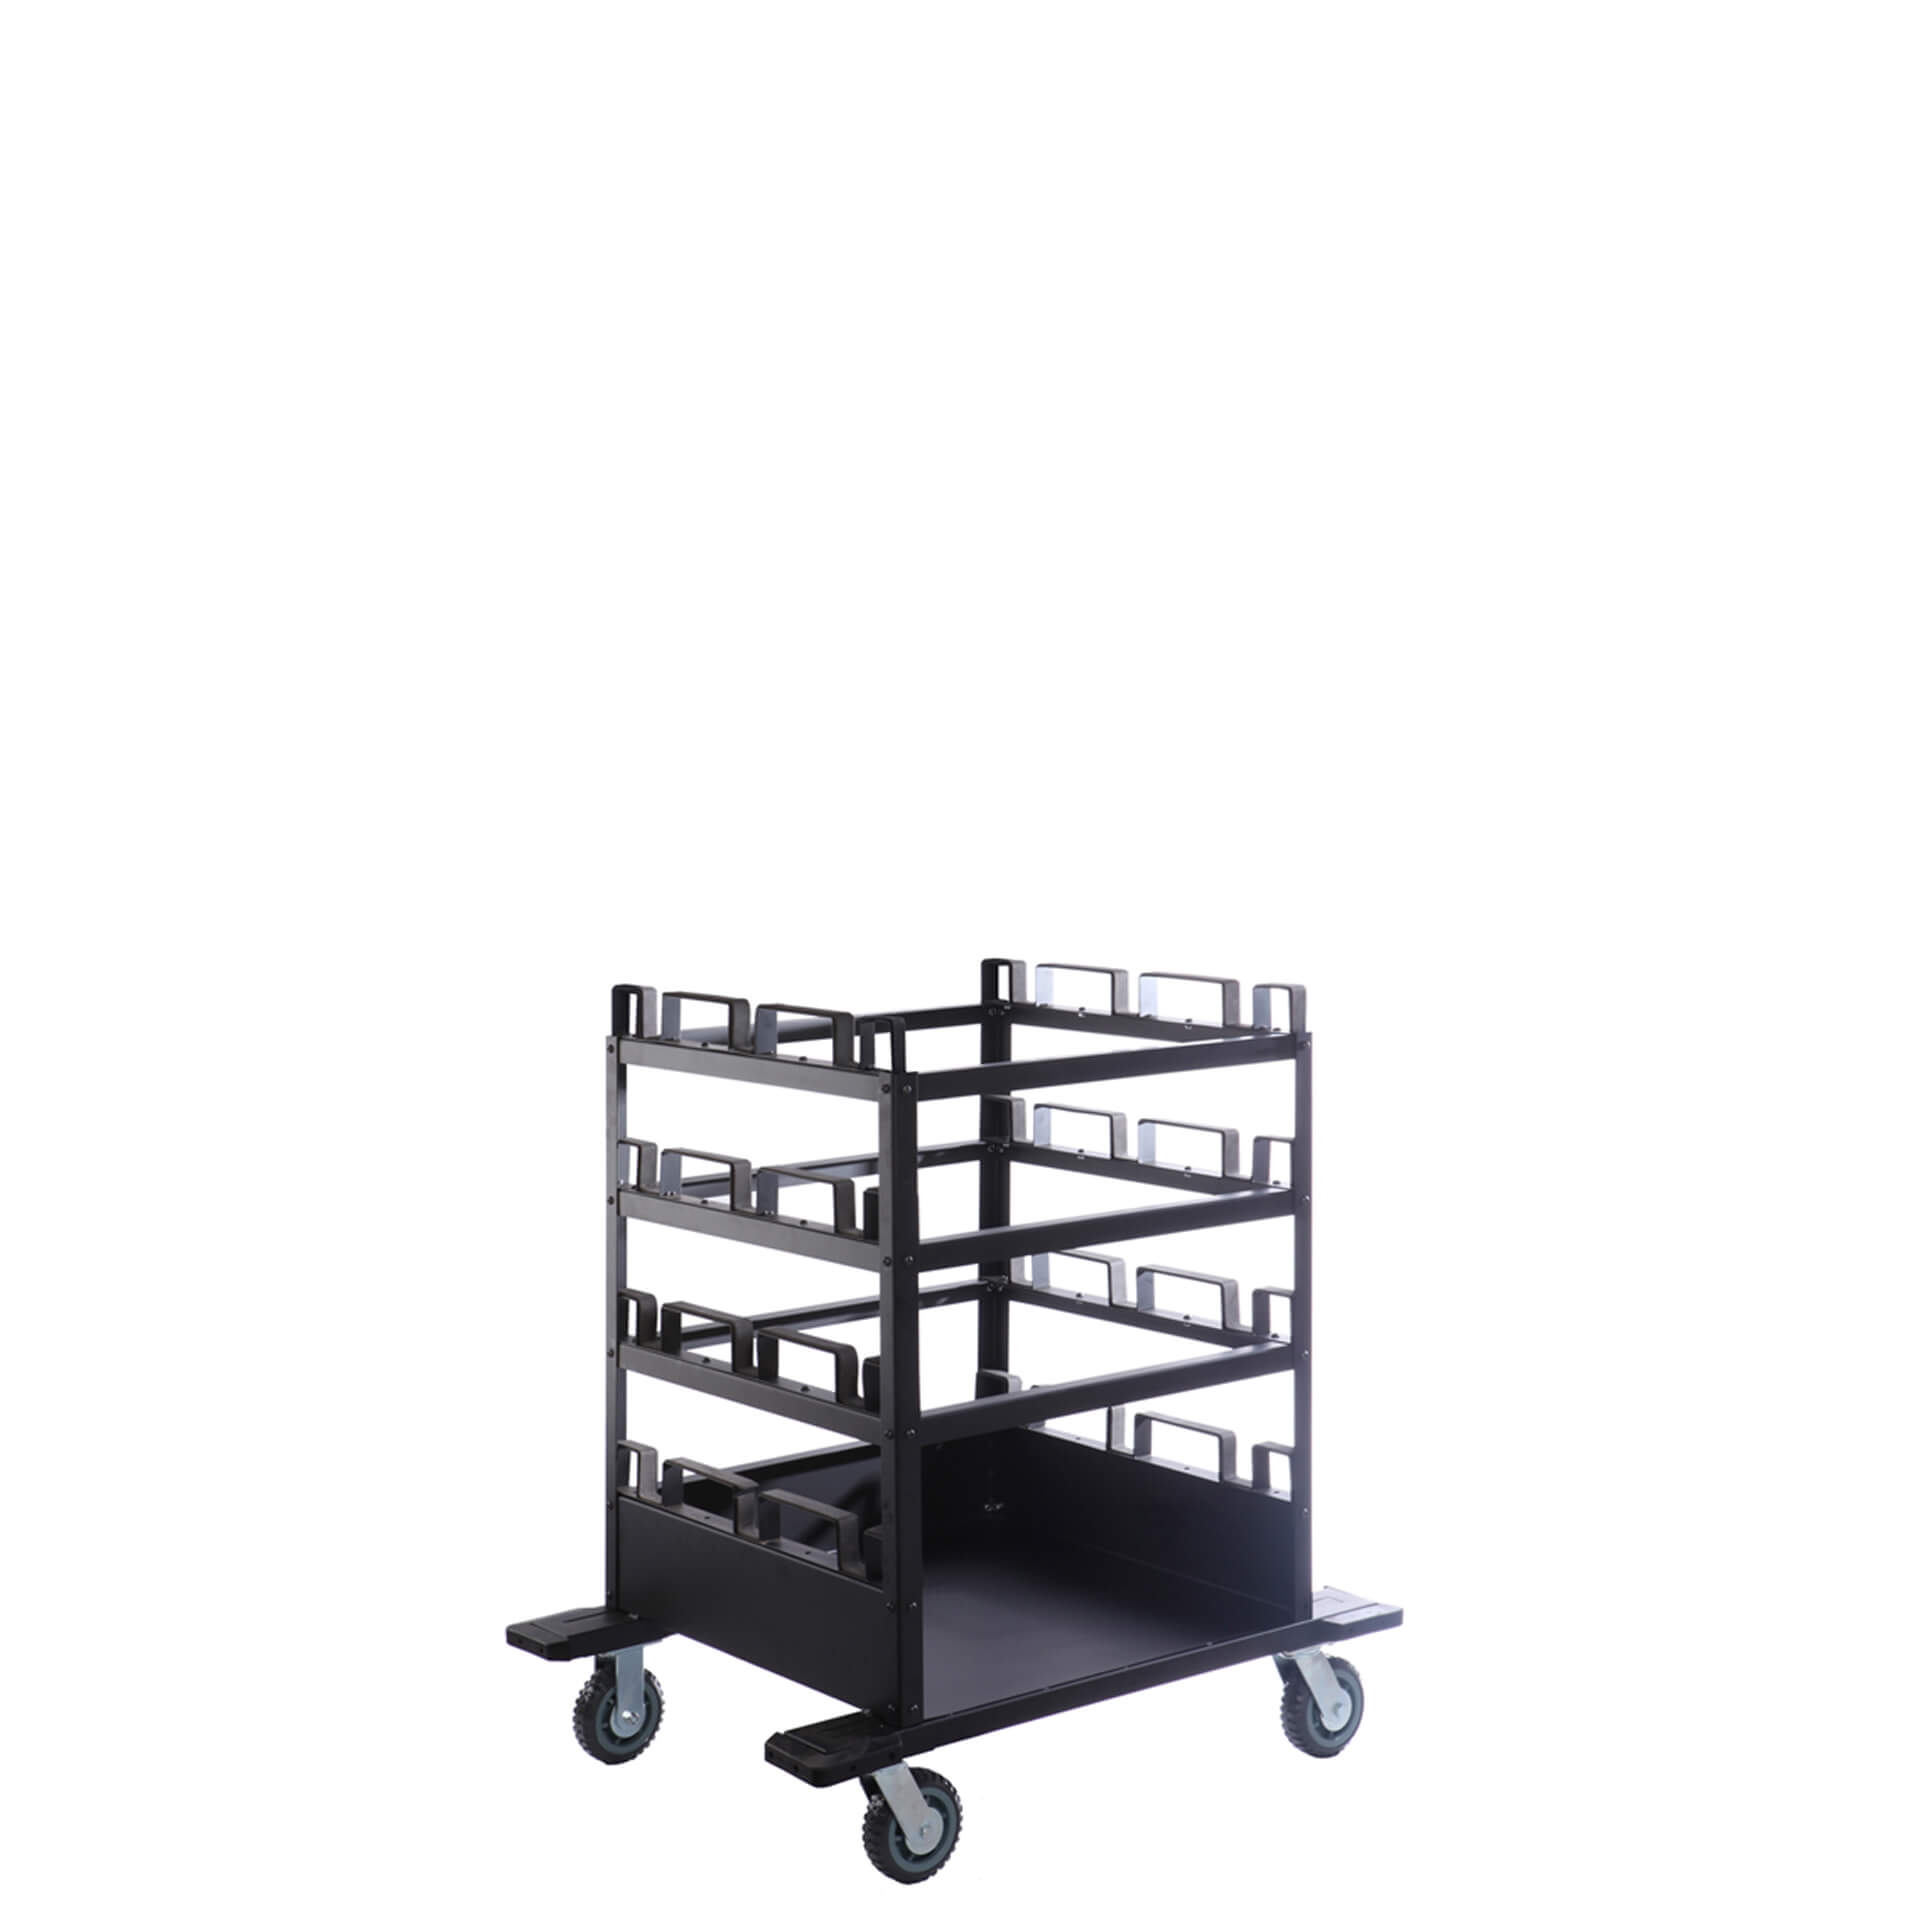 12-post-stanchion-horizontal-storage-cart